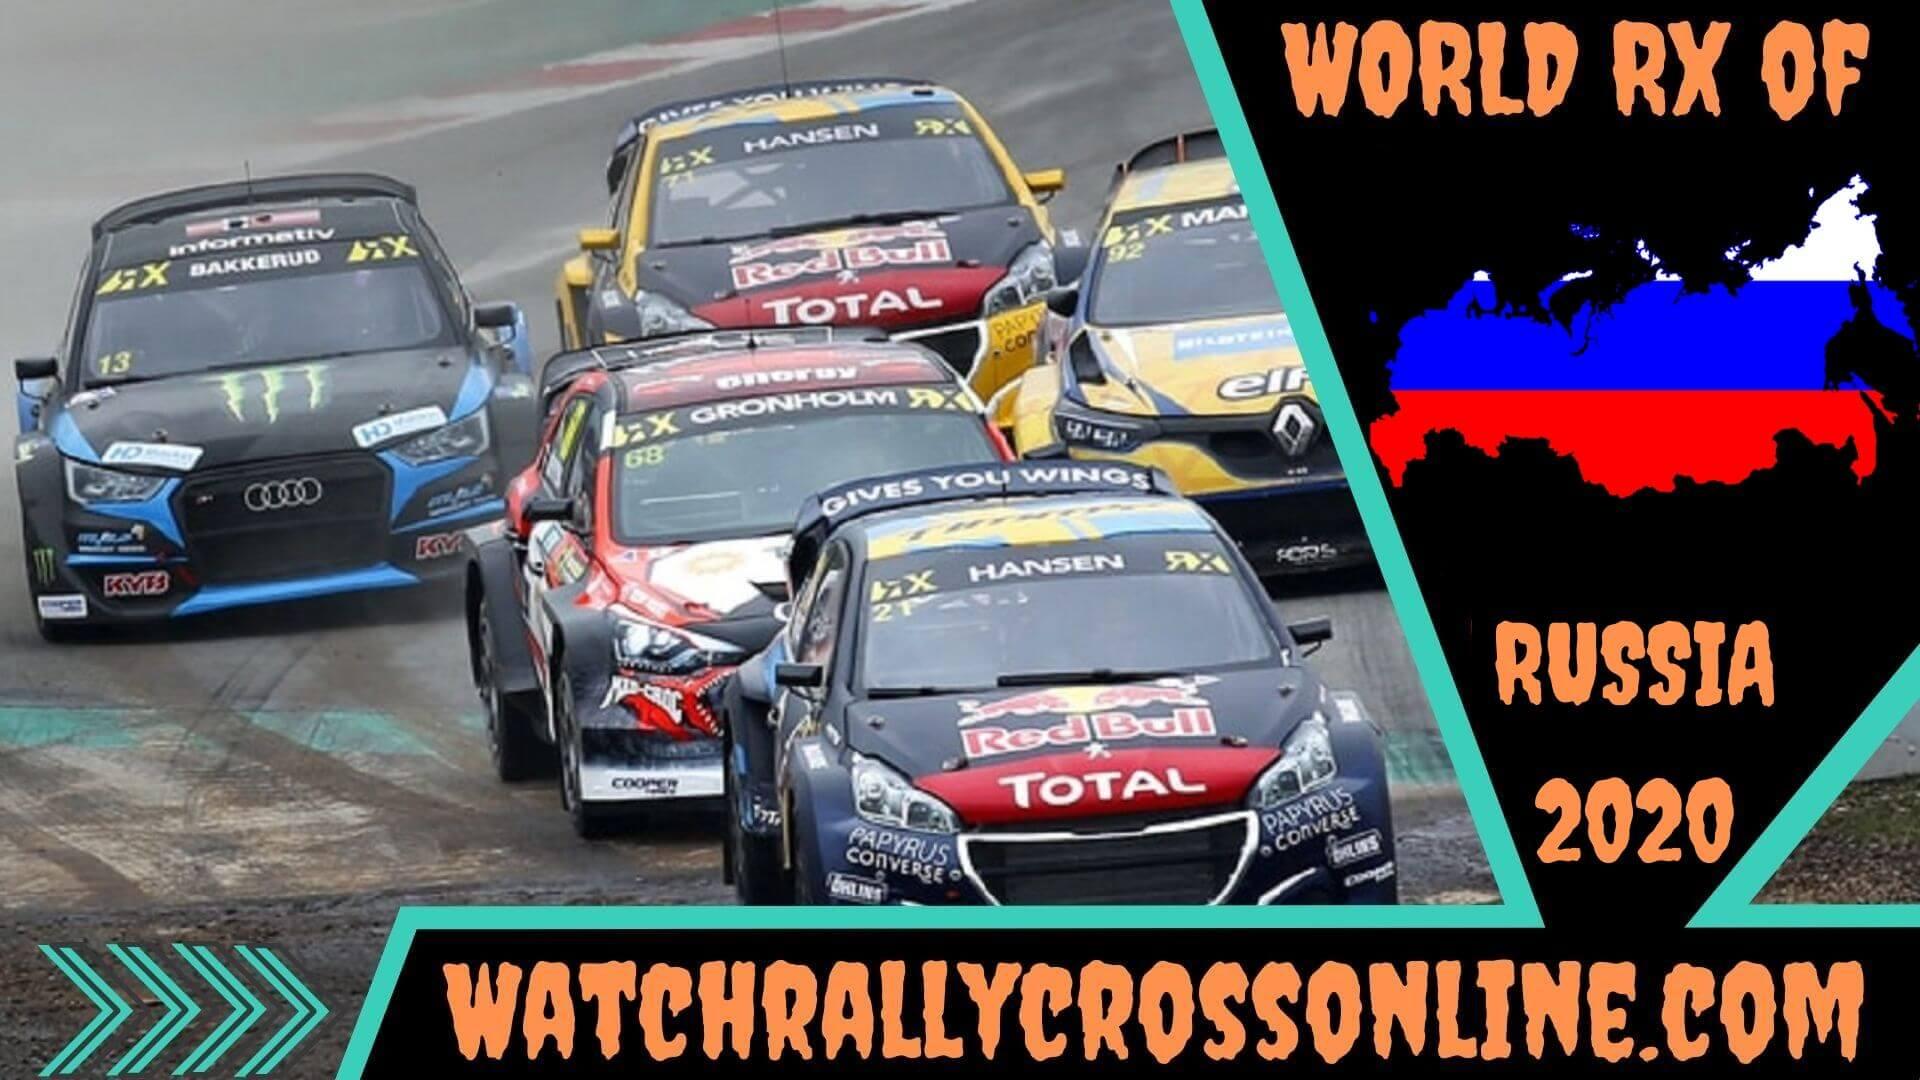 World Rallycross of Russia Live Stream 2020 | Round 6